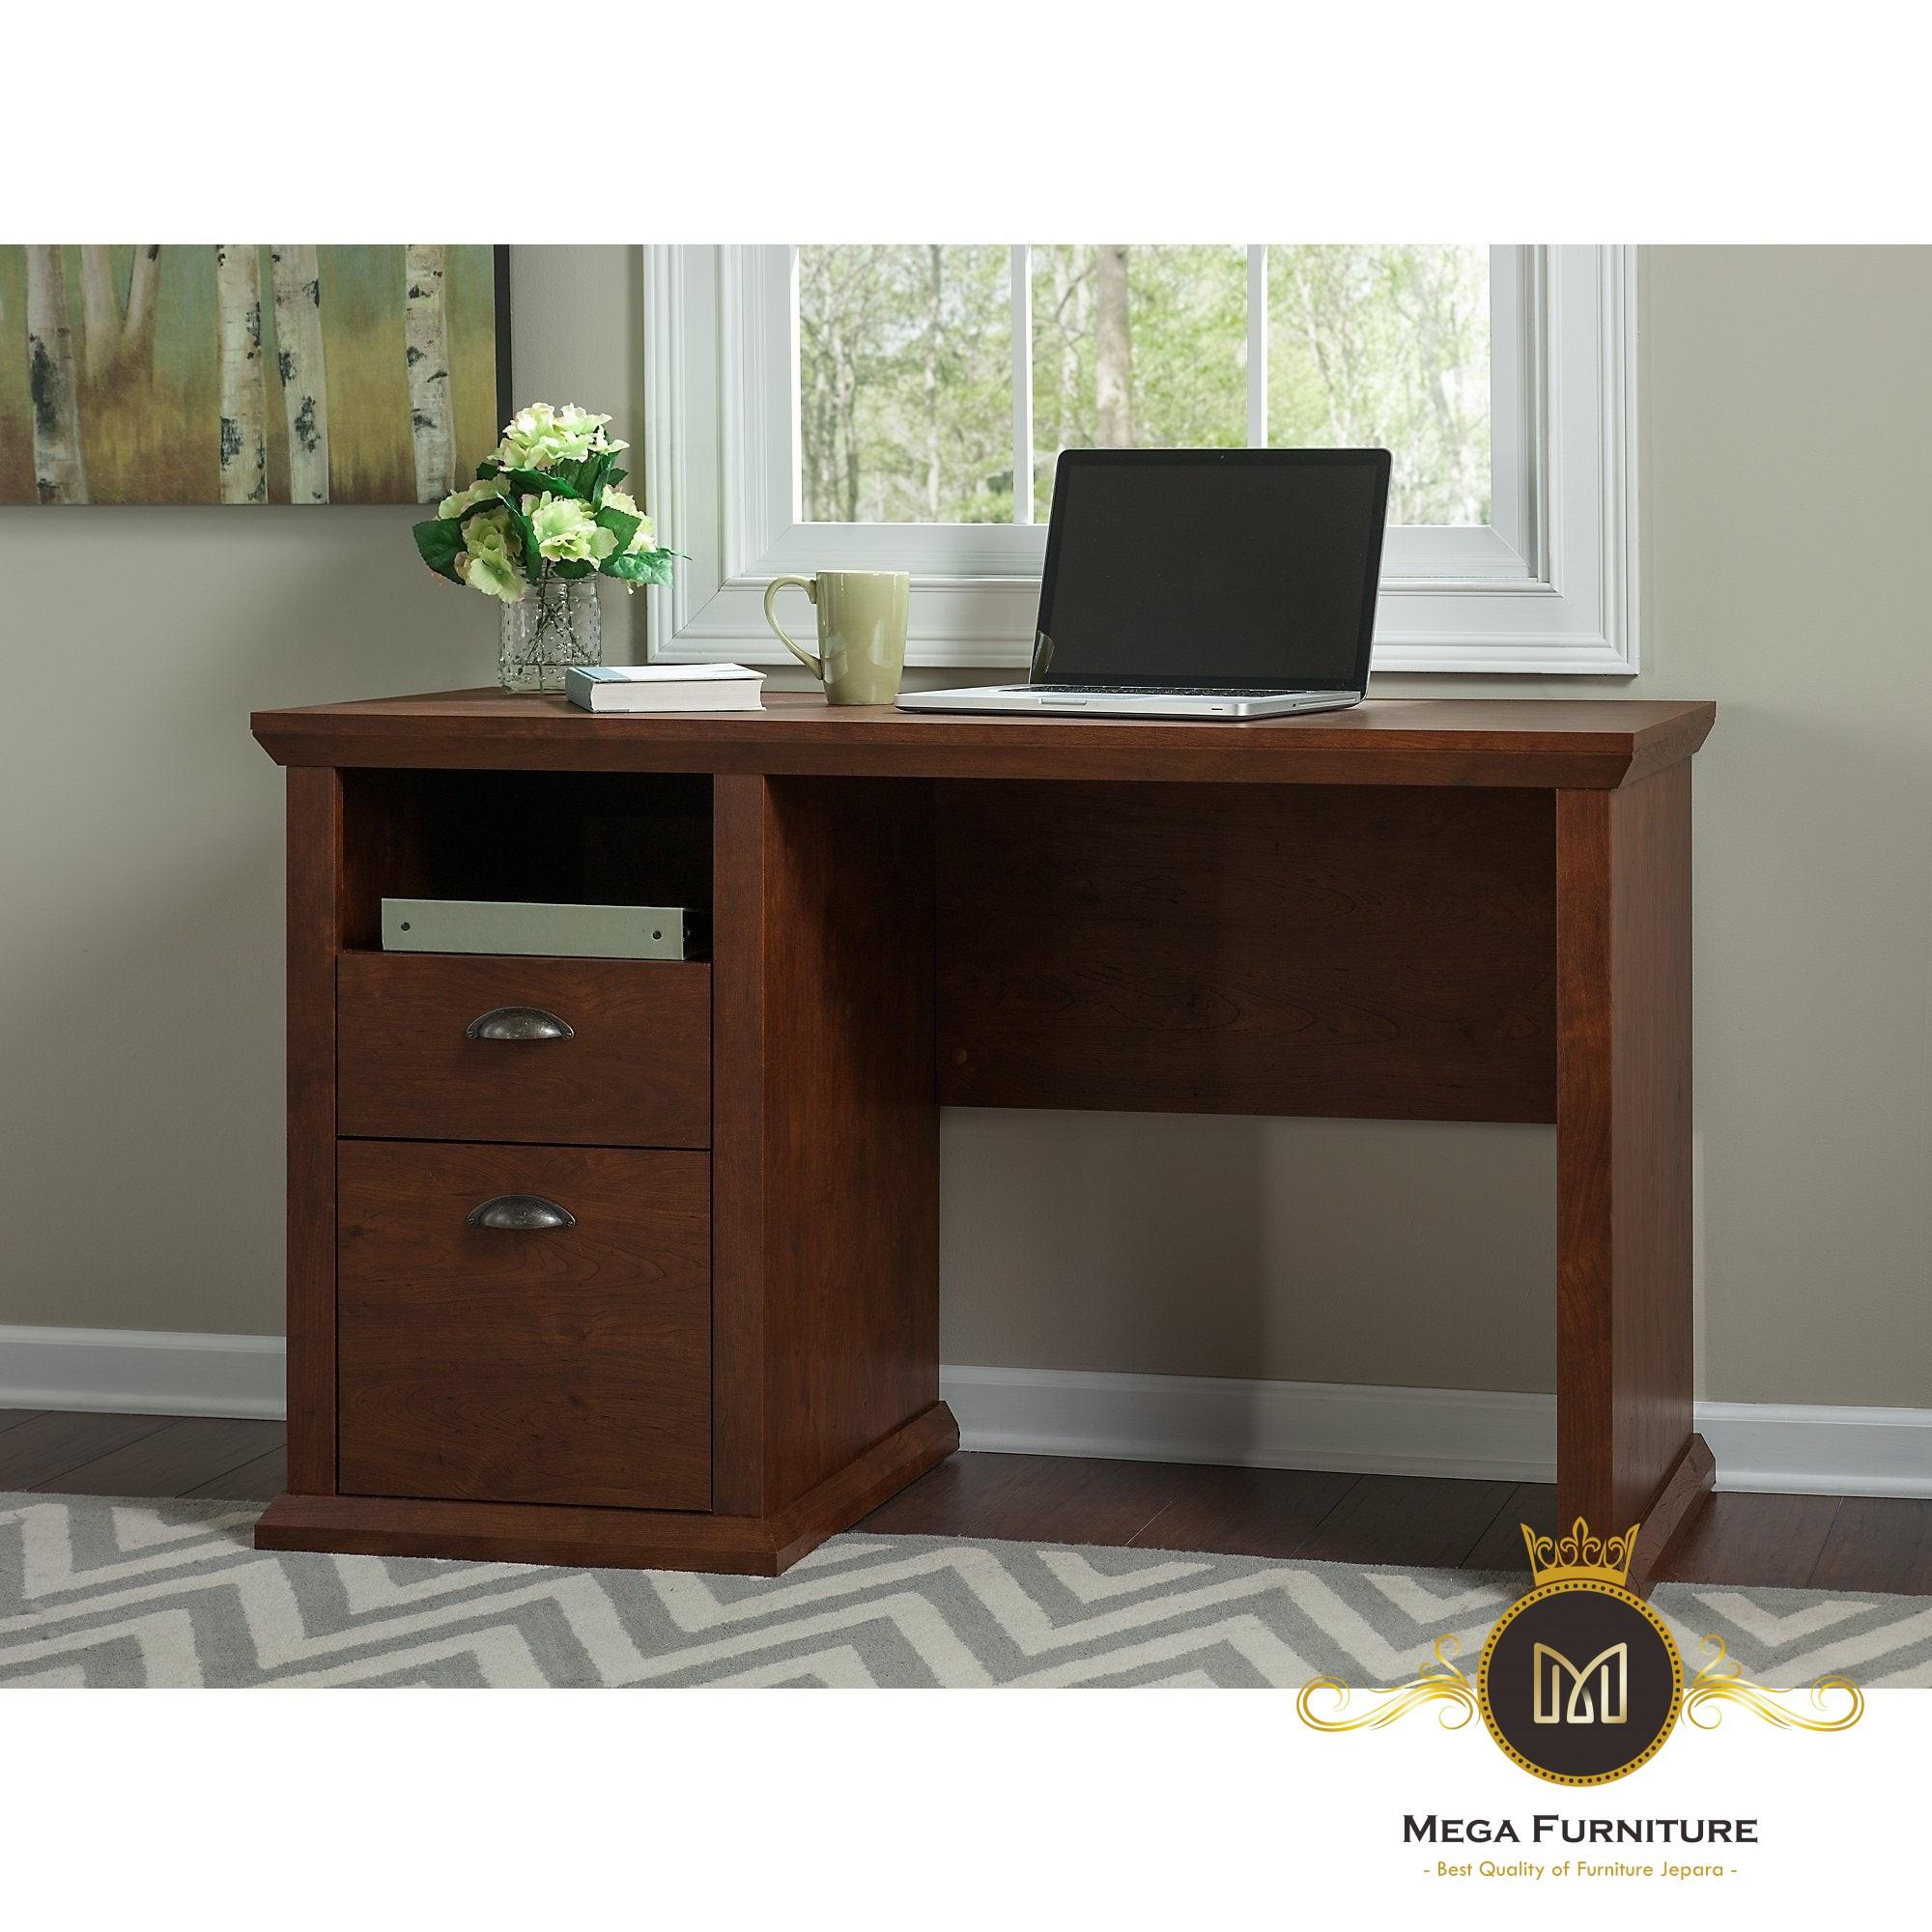 Meja Kantor Laptop Minimalis Terbaru, Meja Kantor L Modern, Meja Kantor Minimalis, Meja Kantor, Meja Kantor Kayu Jati, Meja Kantor Jati, Meja Kantor Terbaru, Meja Kantor Murah, Harga Meja Kantor, Harga Meja Kantor Jati, Harga Meja Kantor Terbaru, Mega Furniture